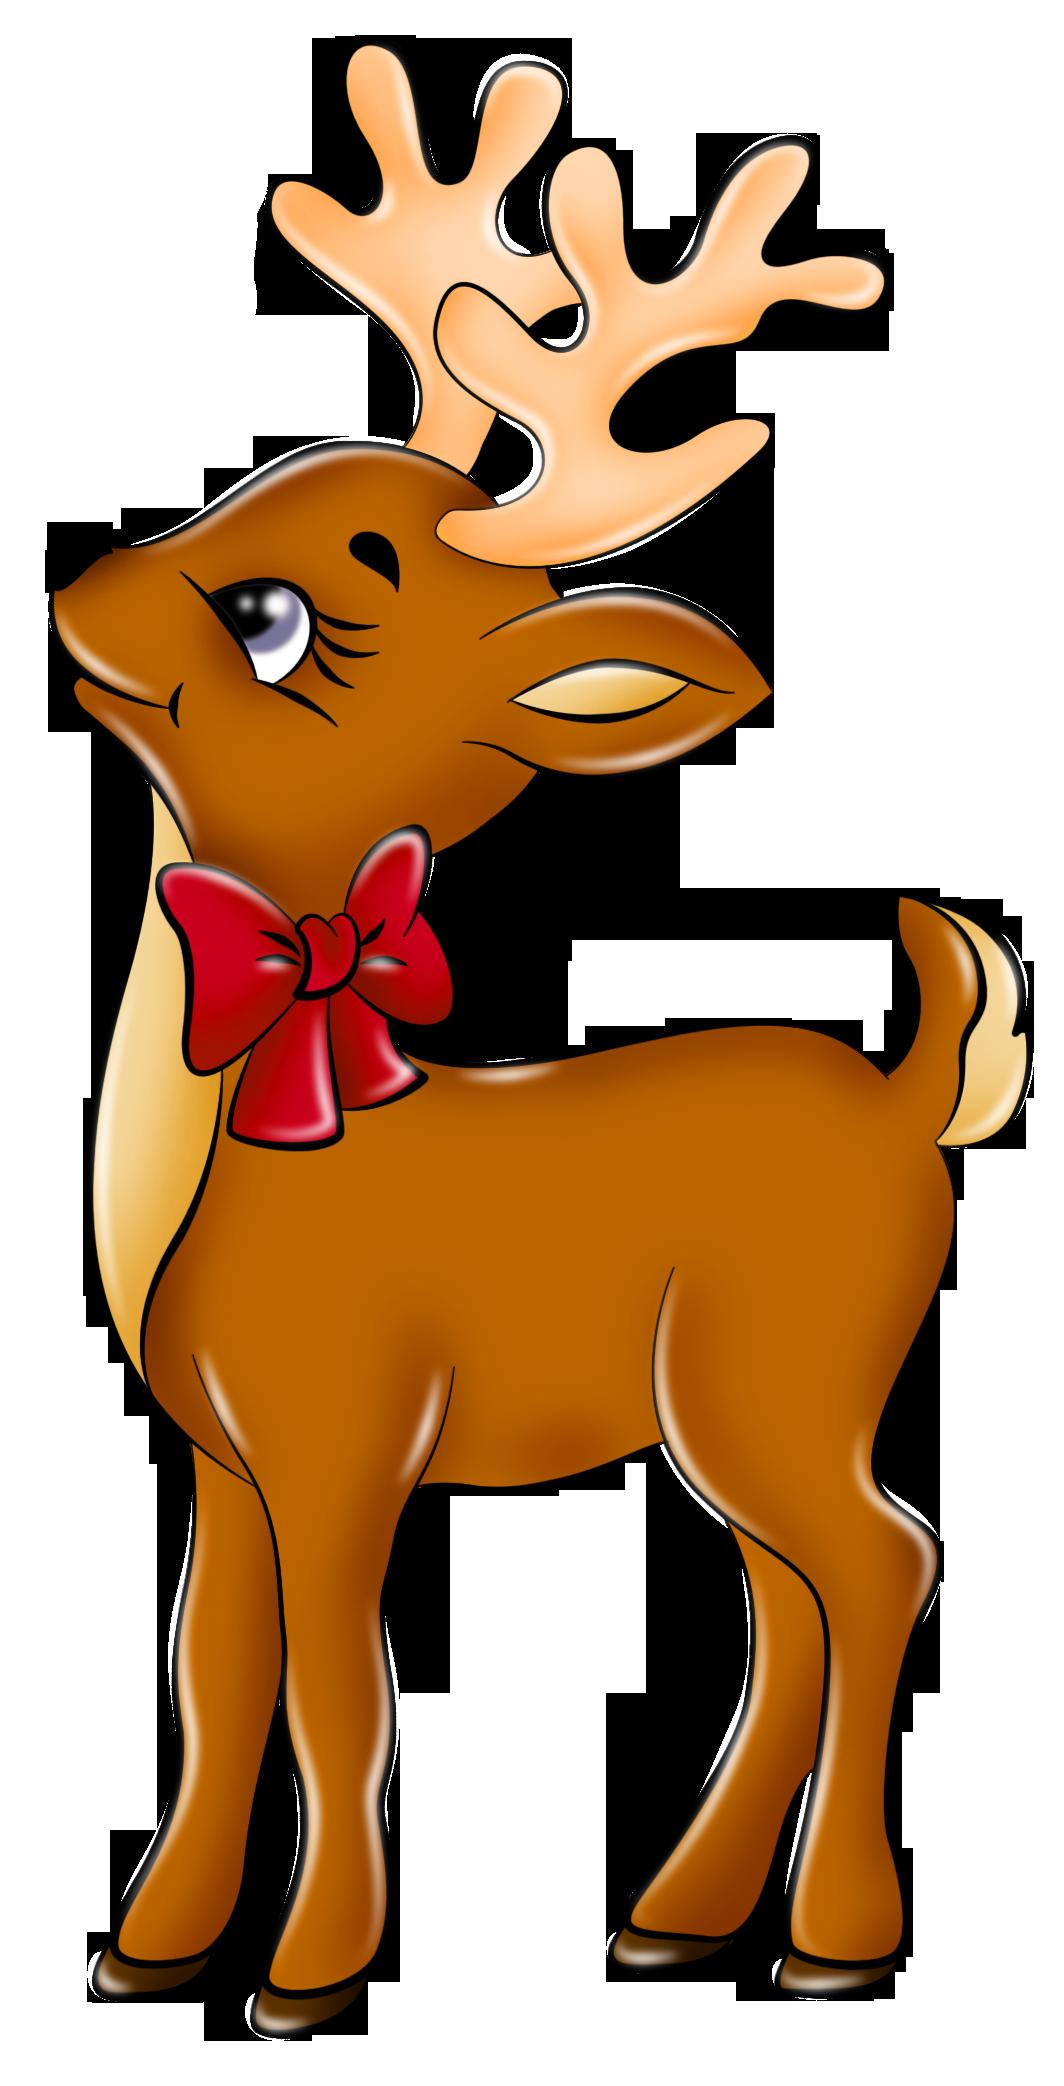 Reindeer clipart free download clip art on.